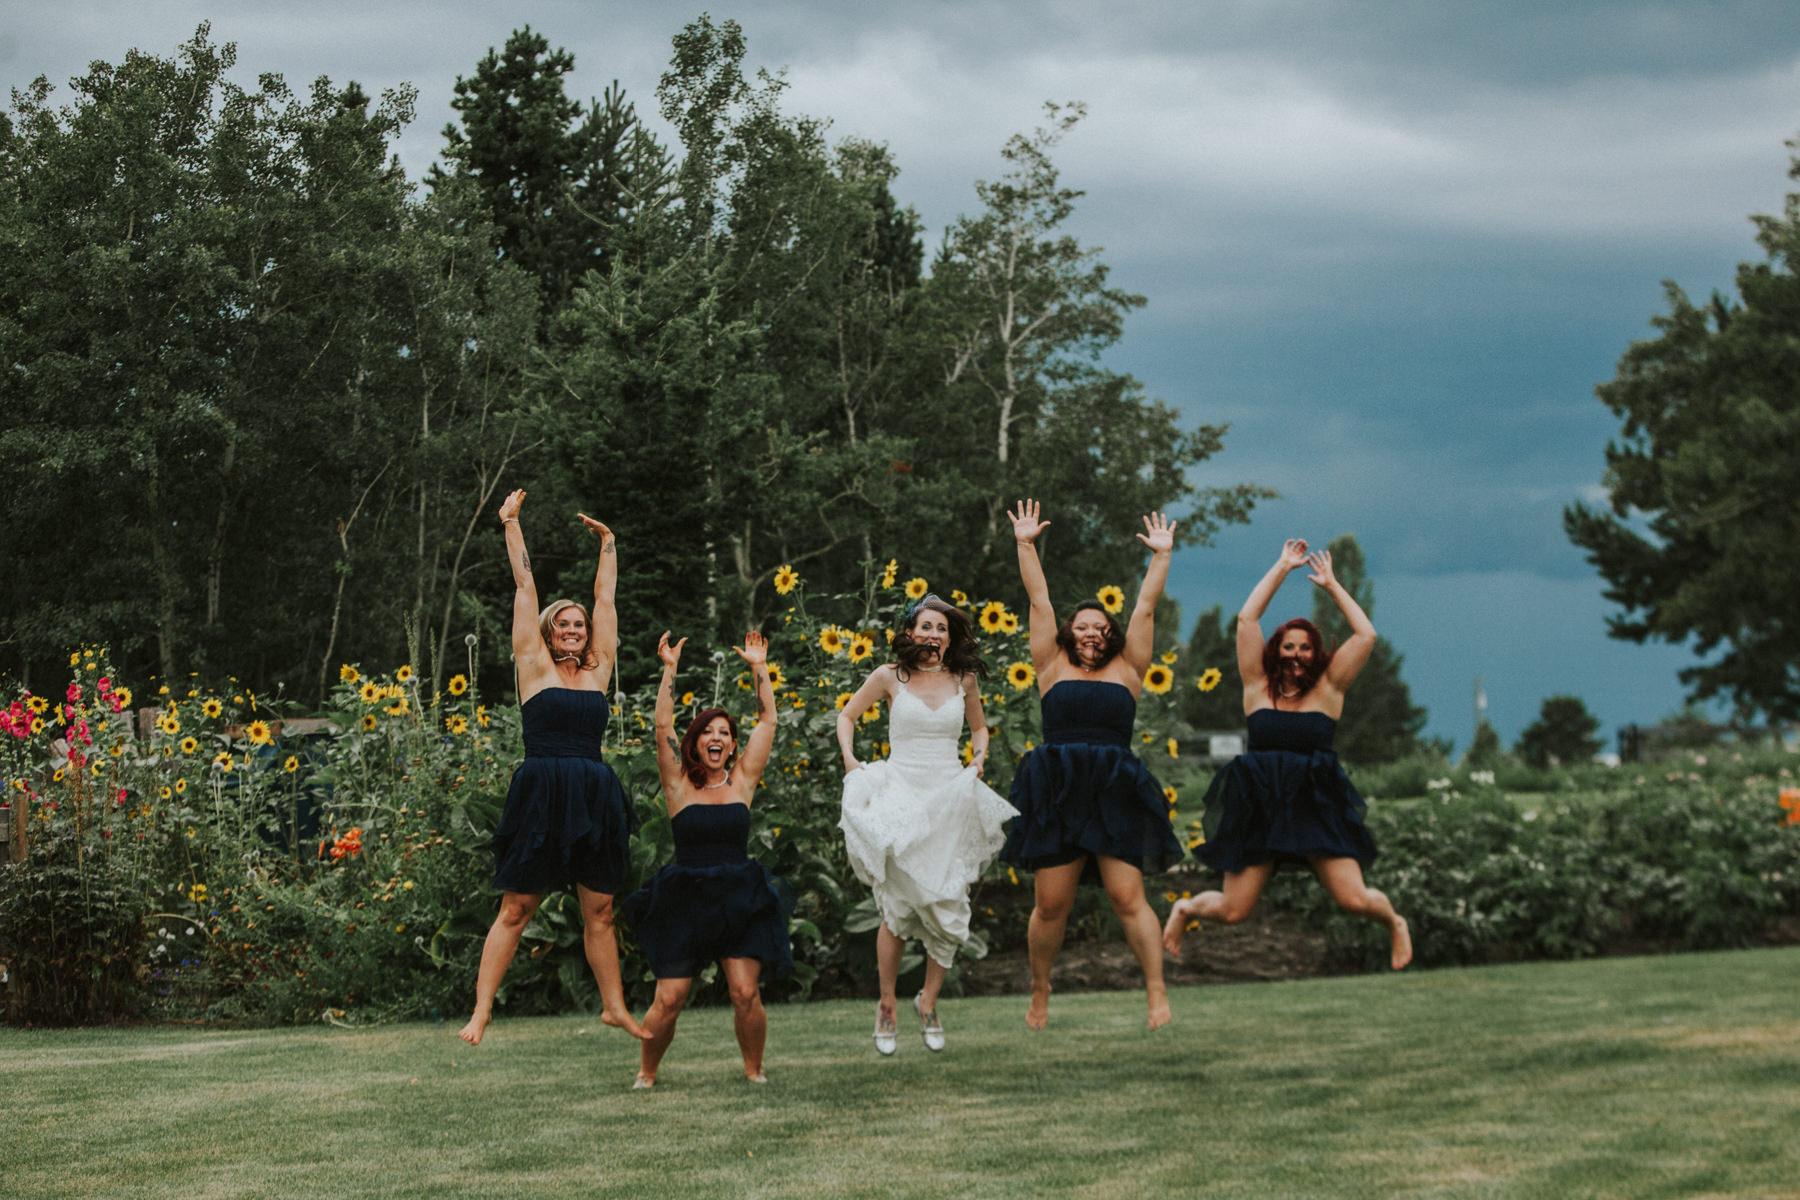 Vancouver wedding photographer - Pam 2